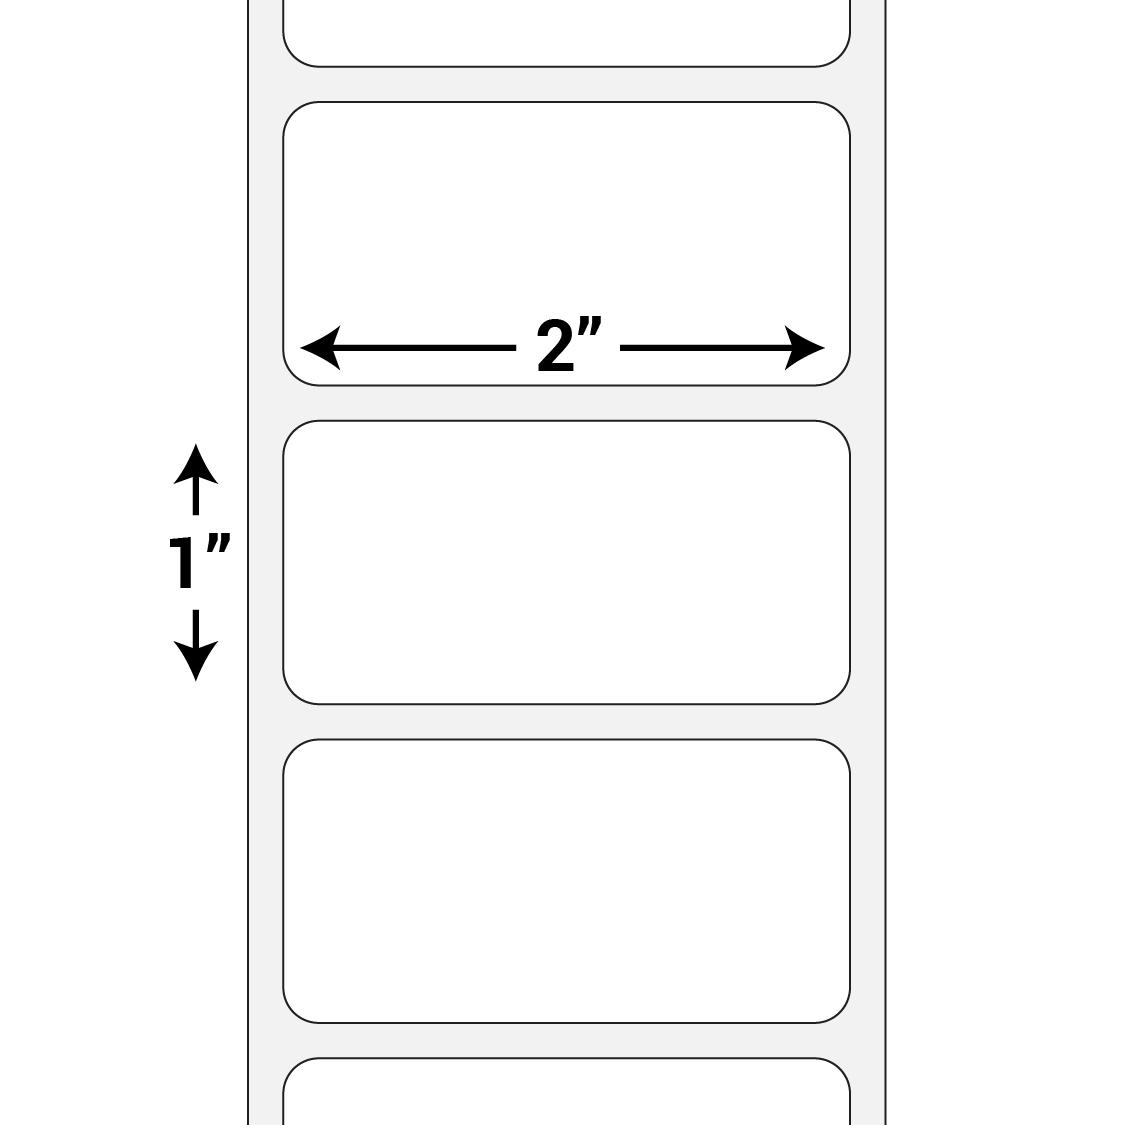 2 x 1 high gloss paper inkjet labels 4600 labels roll bgr